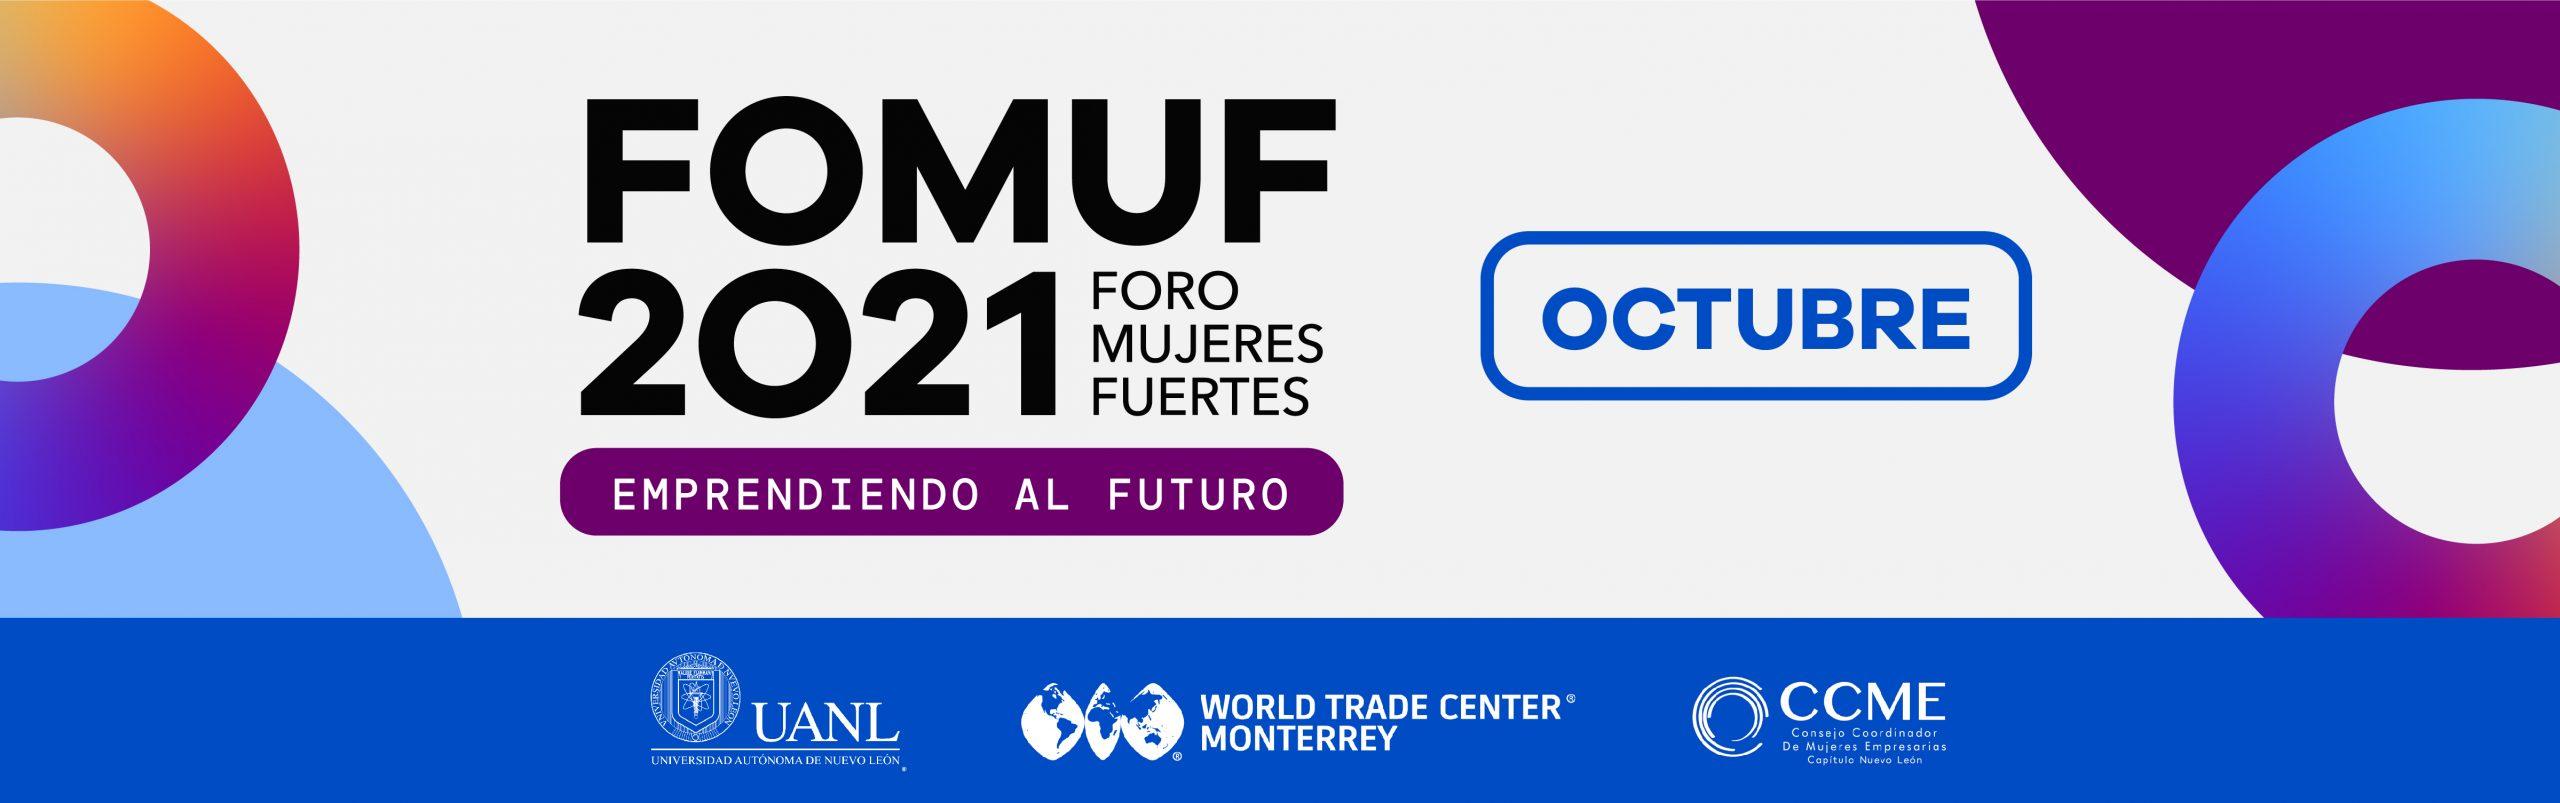 FOMUF Foro Mujeres Fuertes 2021: Emprendiendo al futuro